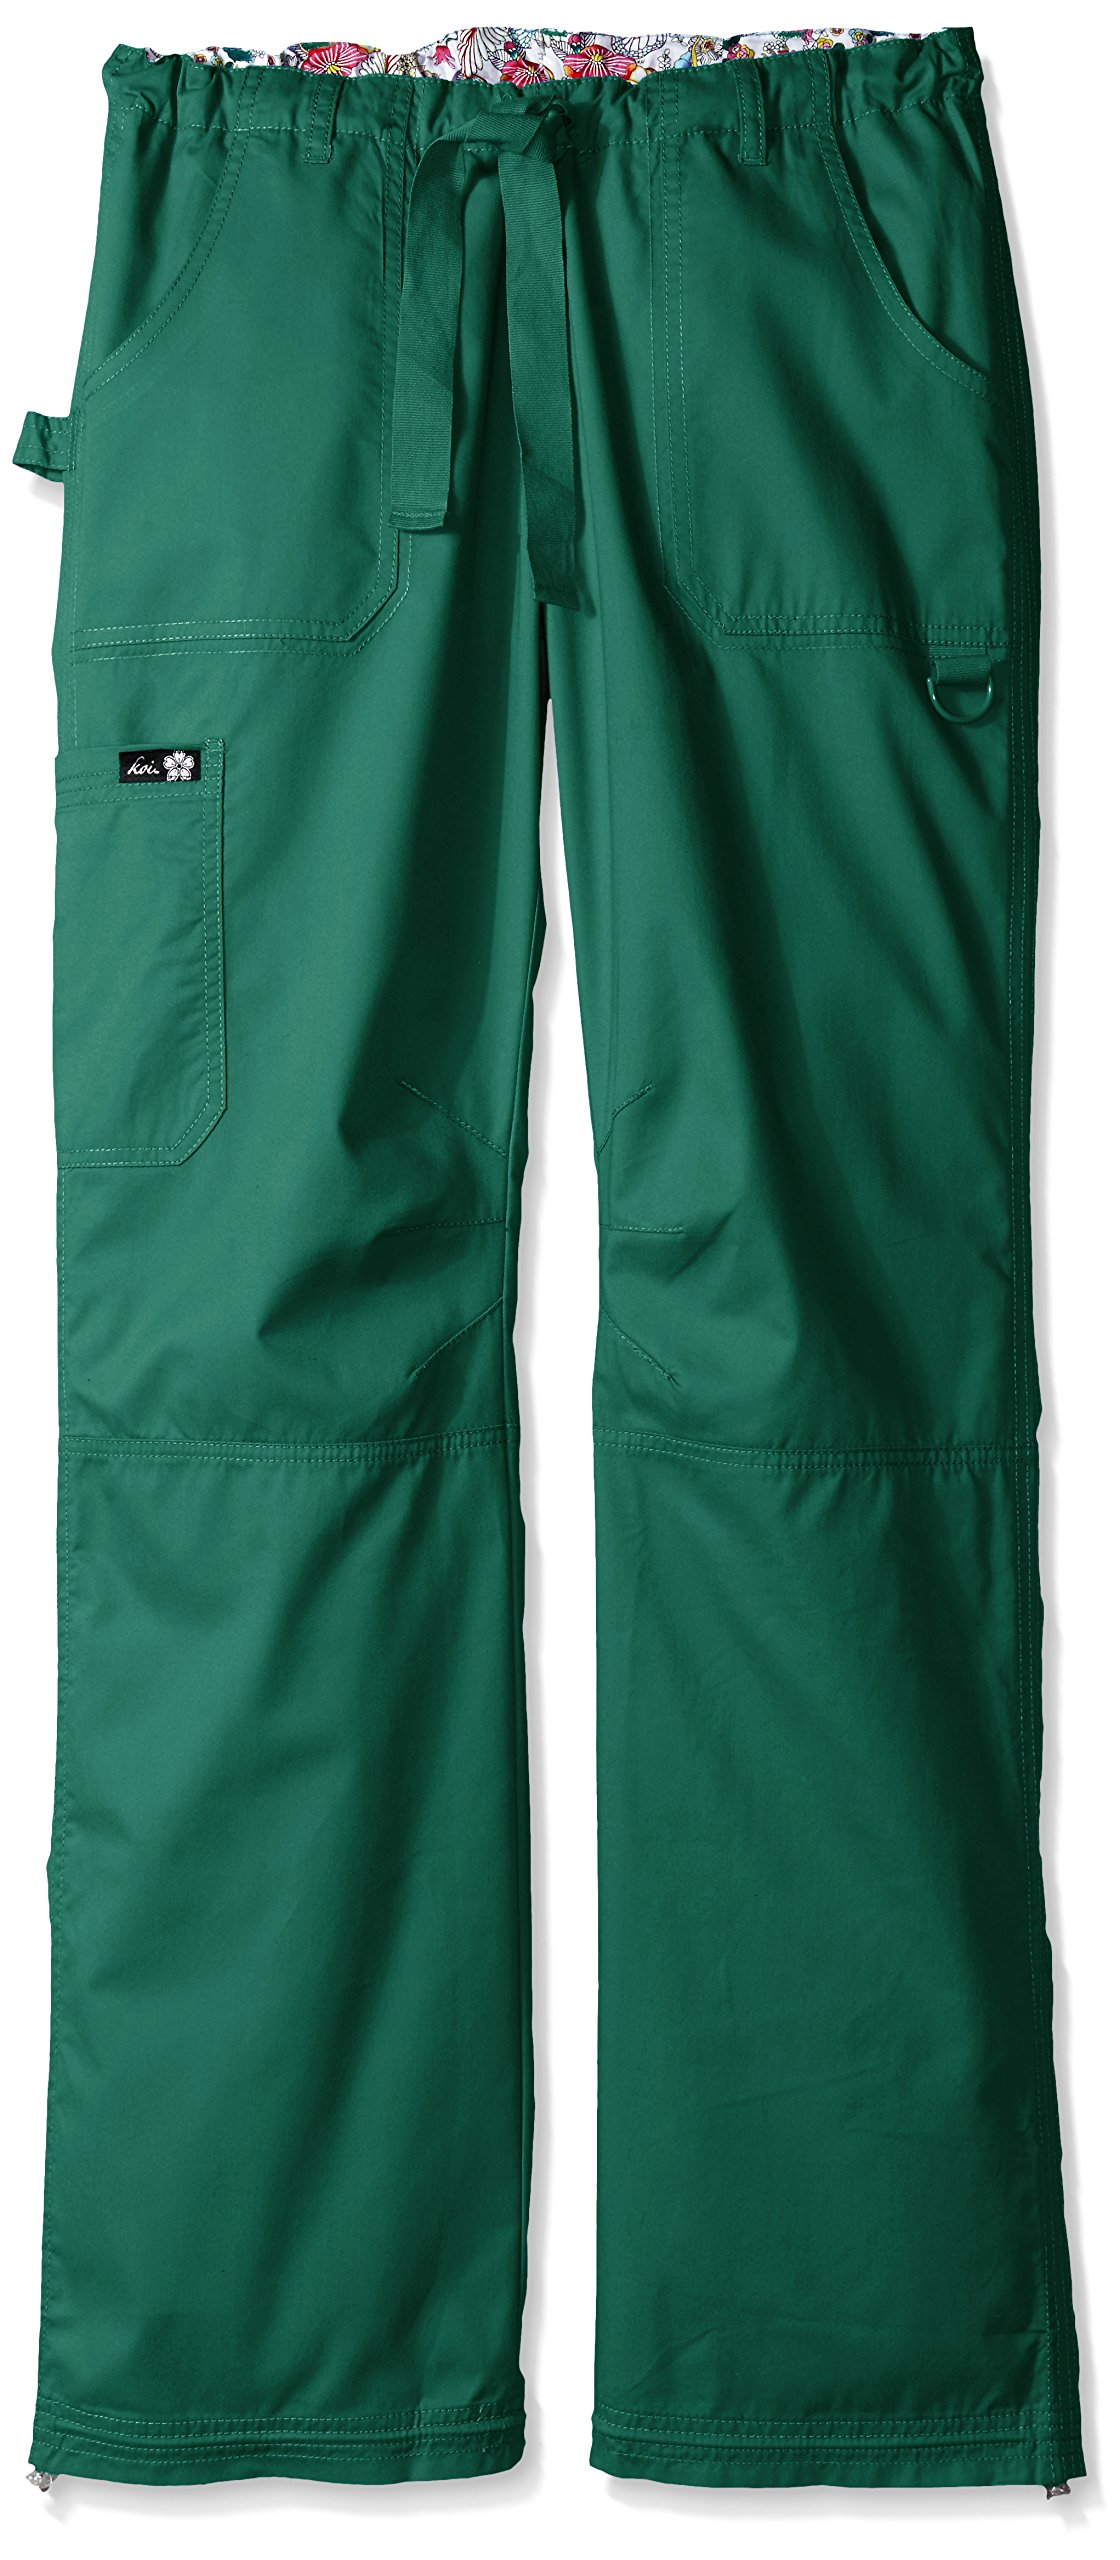 KOI Women's Tall Lindsey Ultra Comfortable Cargo Style Scrub Pants Sizes, Hunter, Medium/Tall